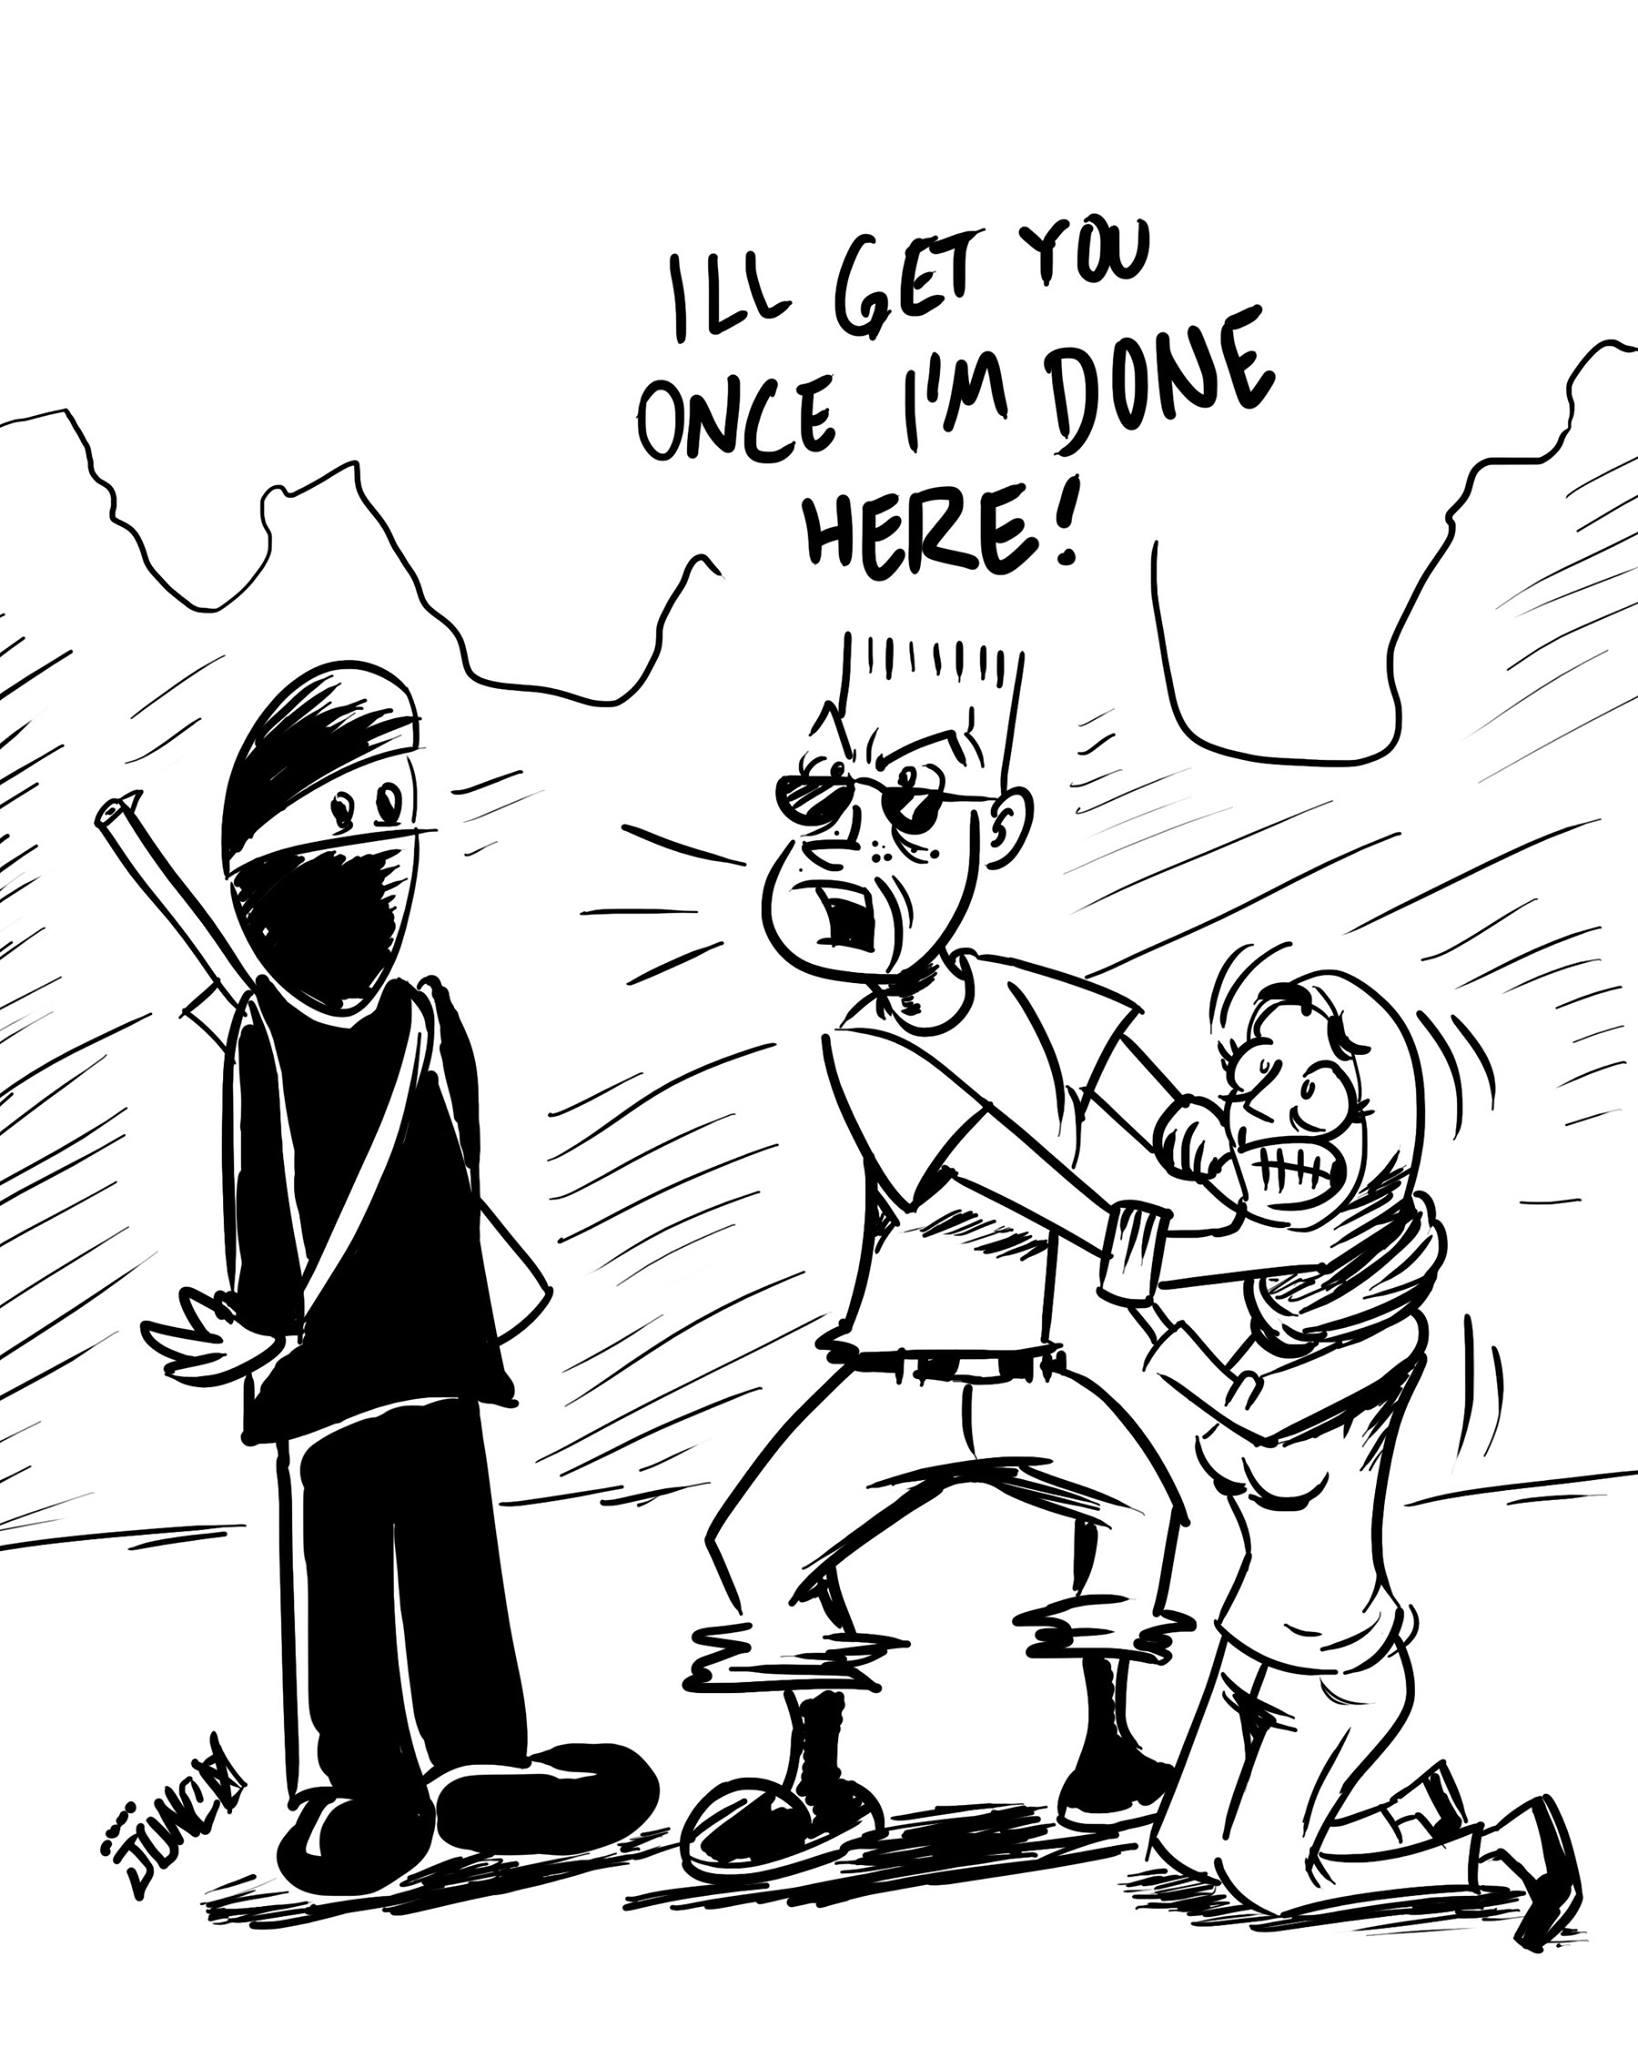 Rampant US Islamophobia must cease